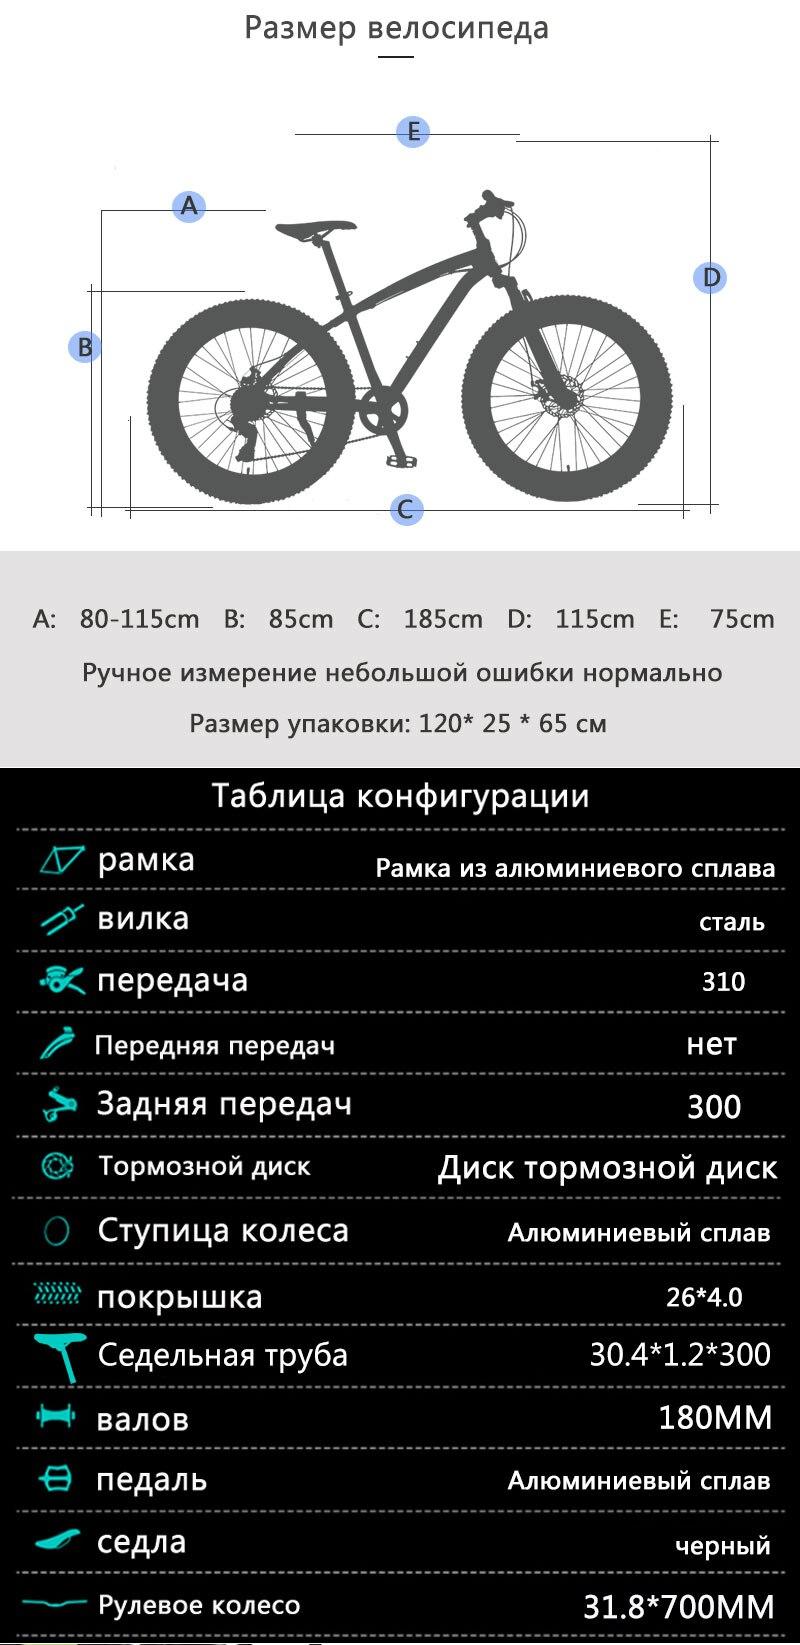 HTB10Nhjev1H3KVjSZFBq6zSMXXa2 Wolf's fang new Bicycle Mountain bike 26 inch Fat Bike 8 speeds Fat Tire Snow Bicycles Man bmx mtb road bikes free shipping